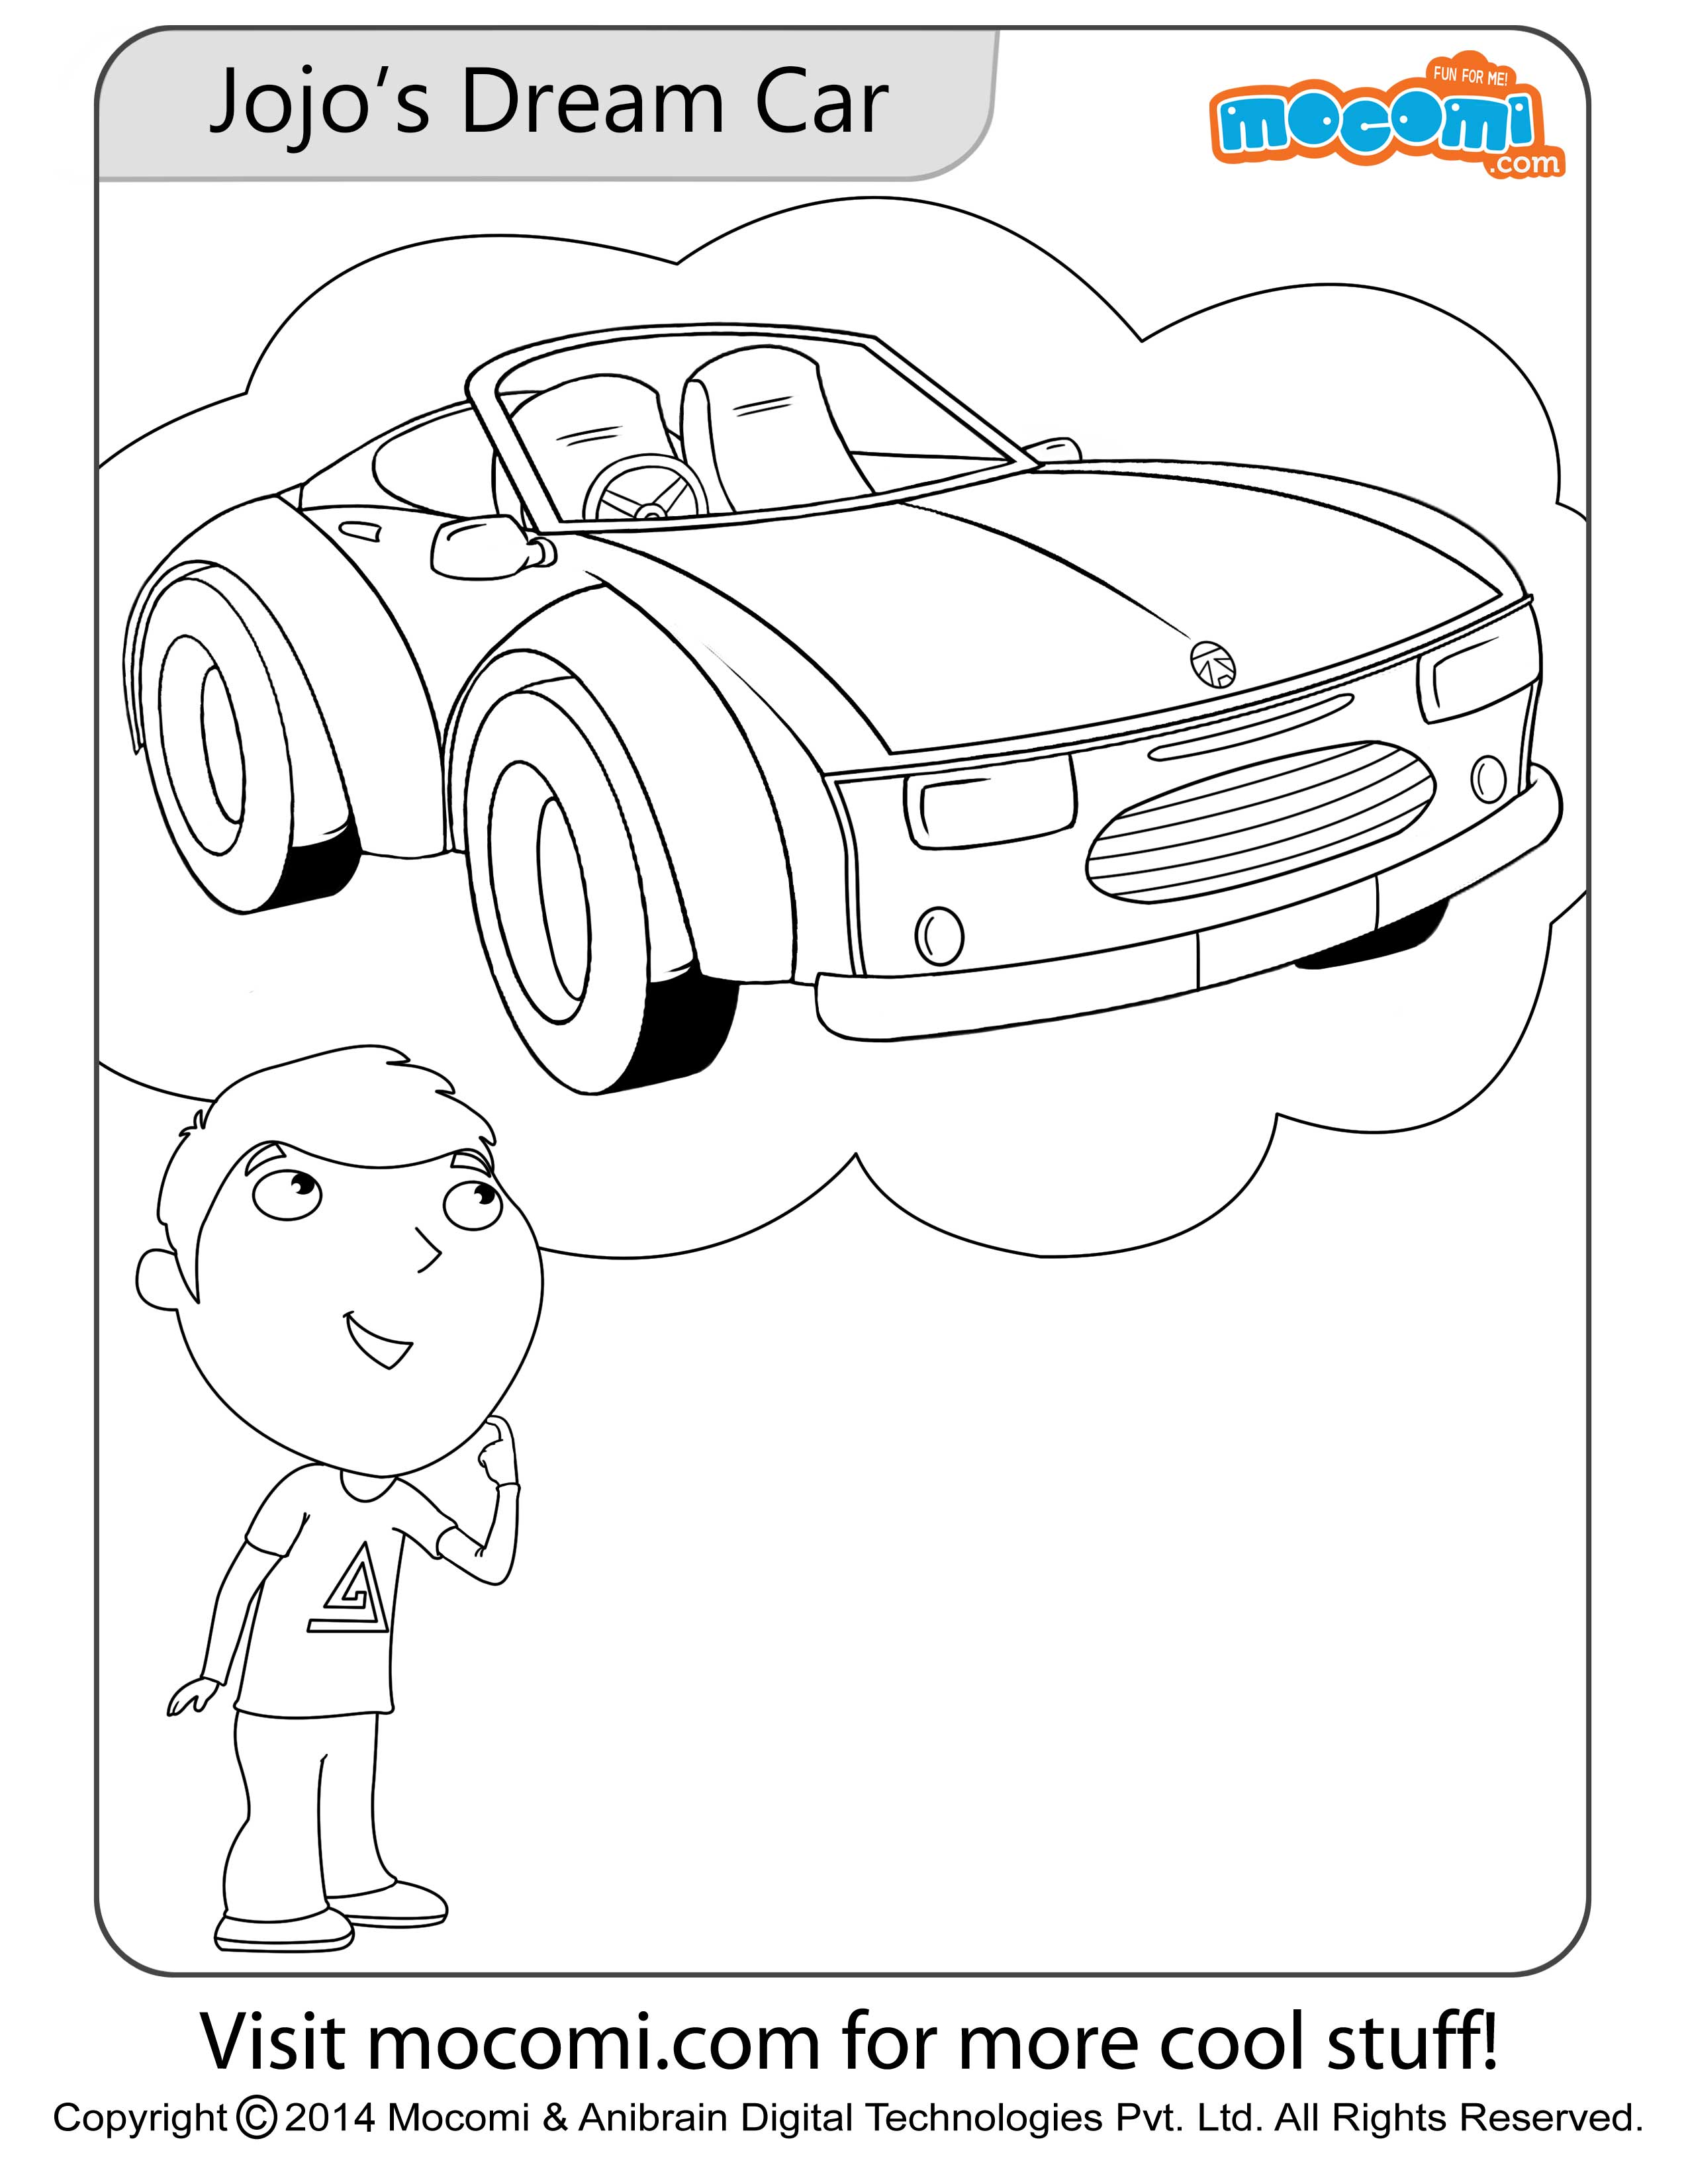 Jojo's Dream Car